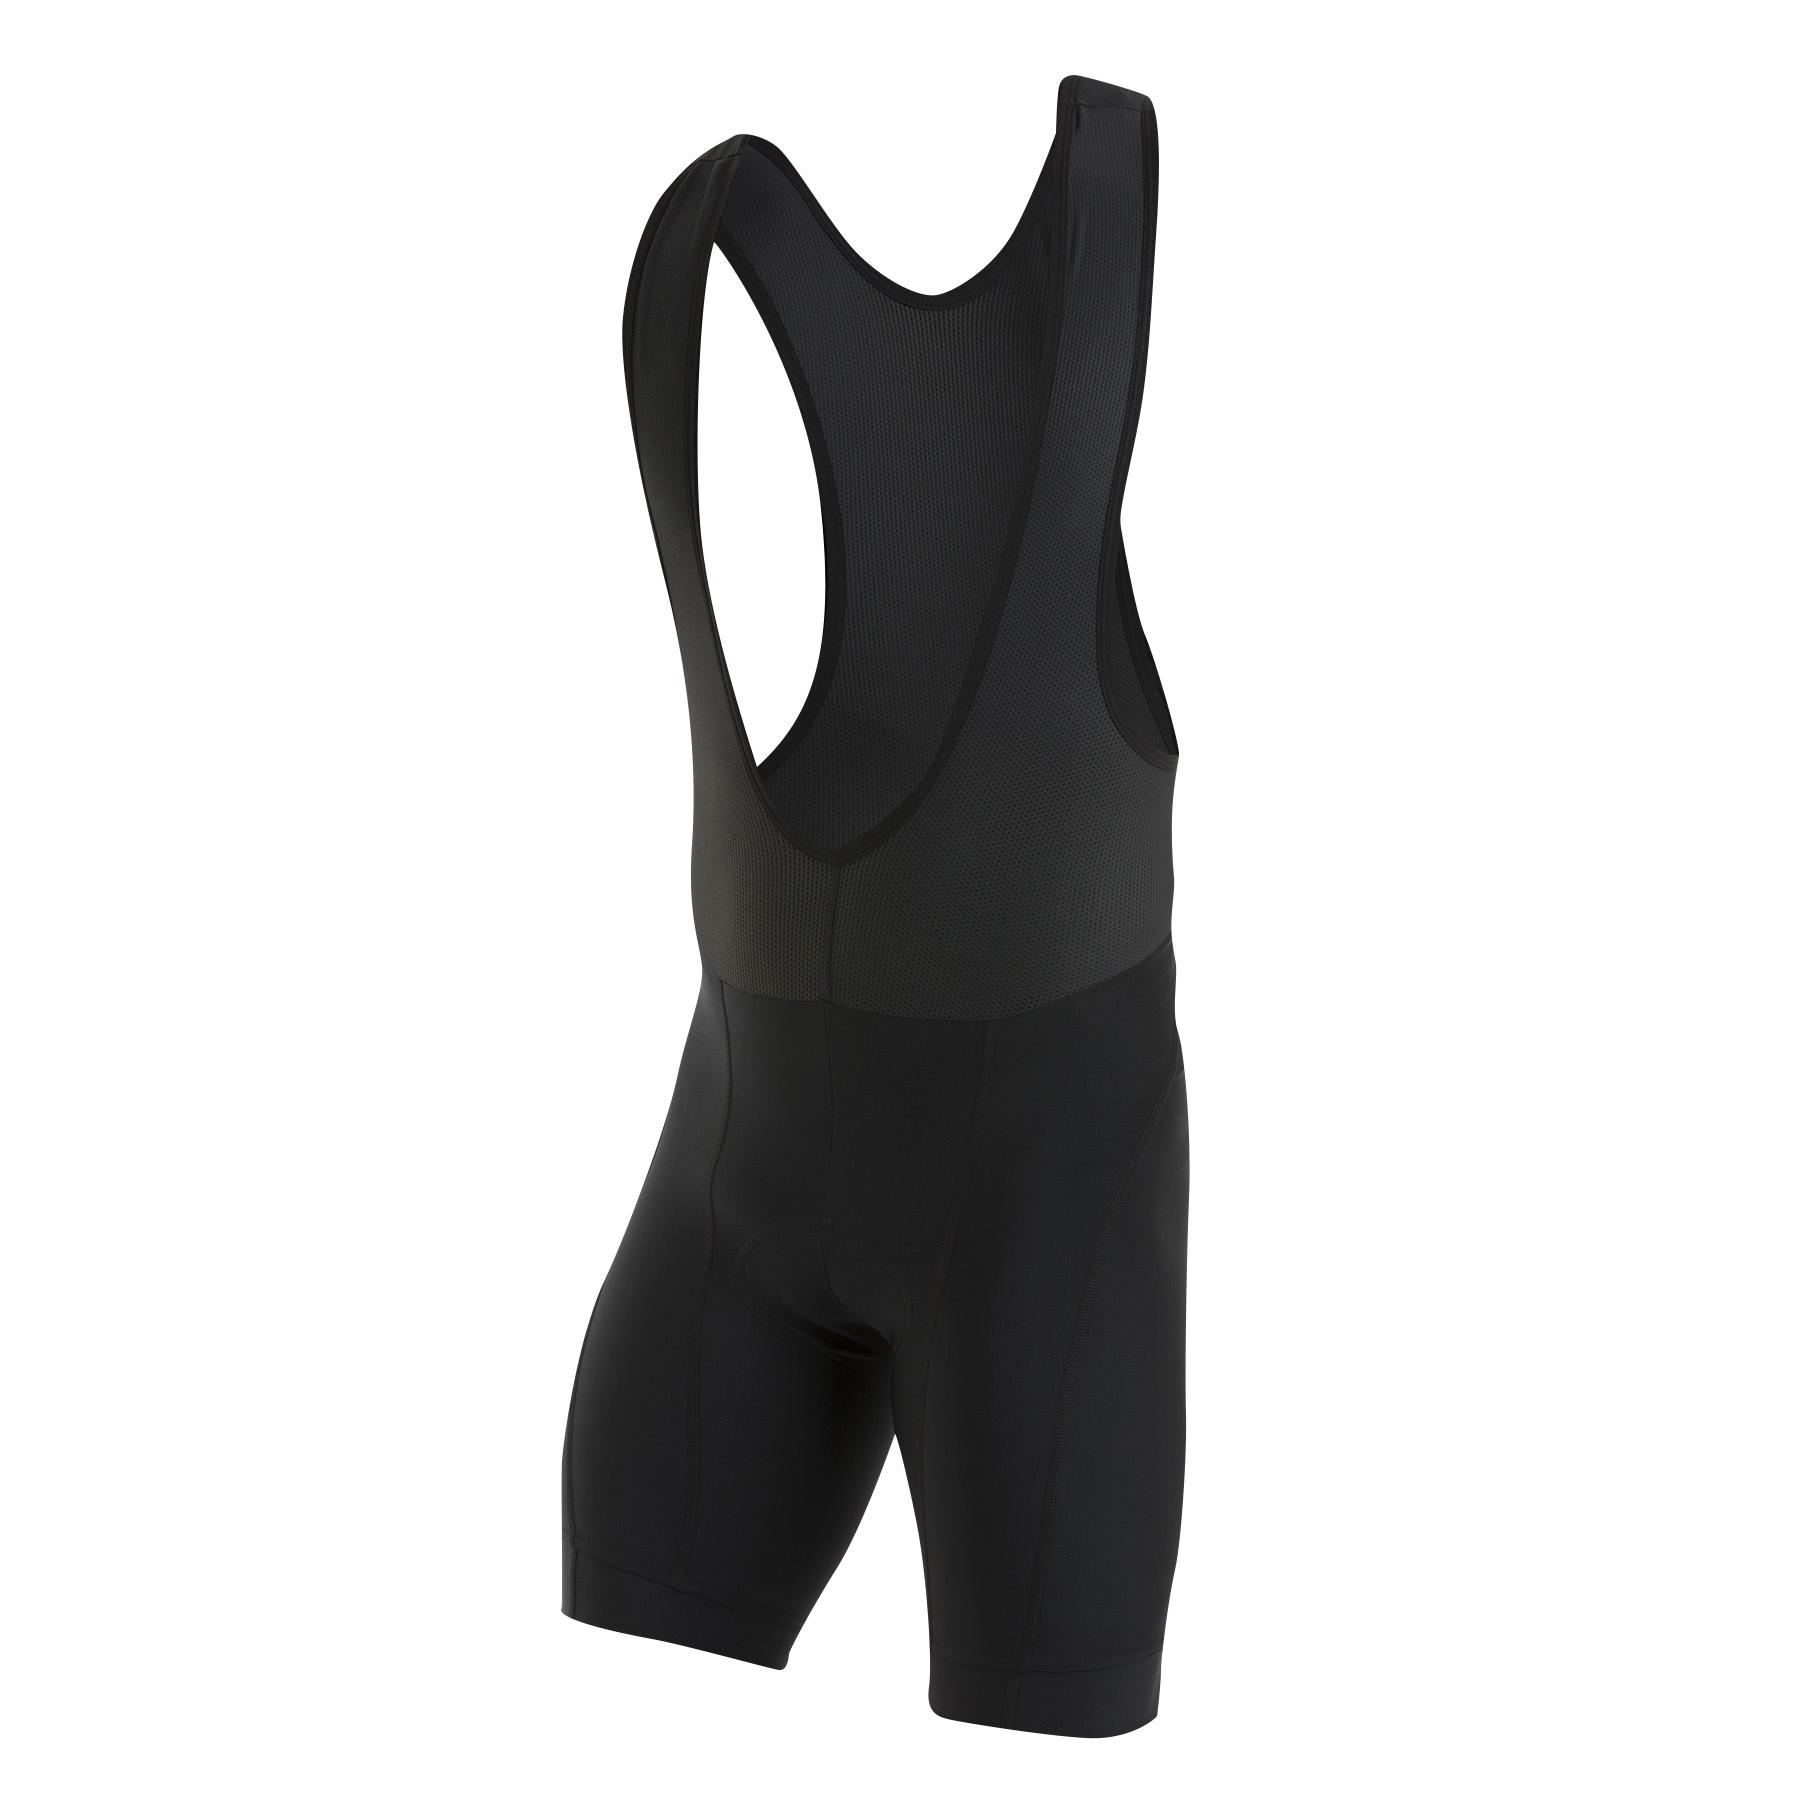 Men's SELECT Pursuit Attack Bib Shorts